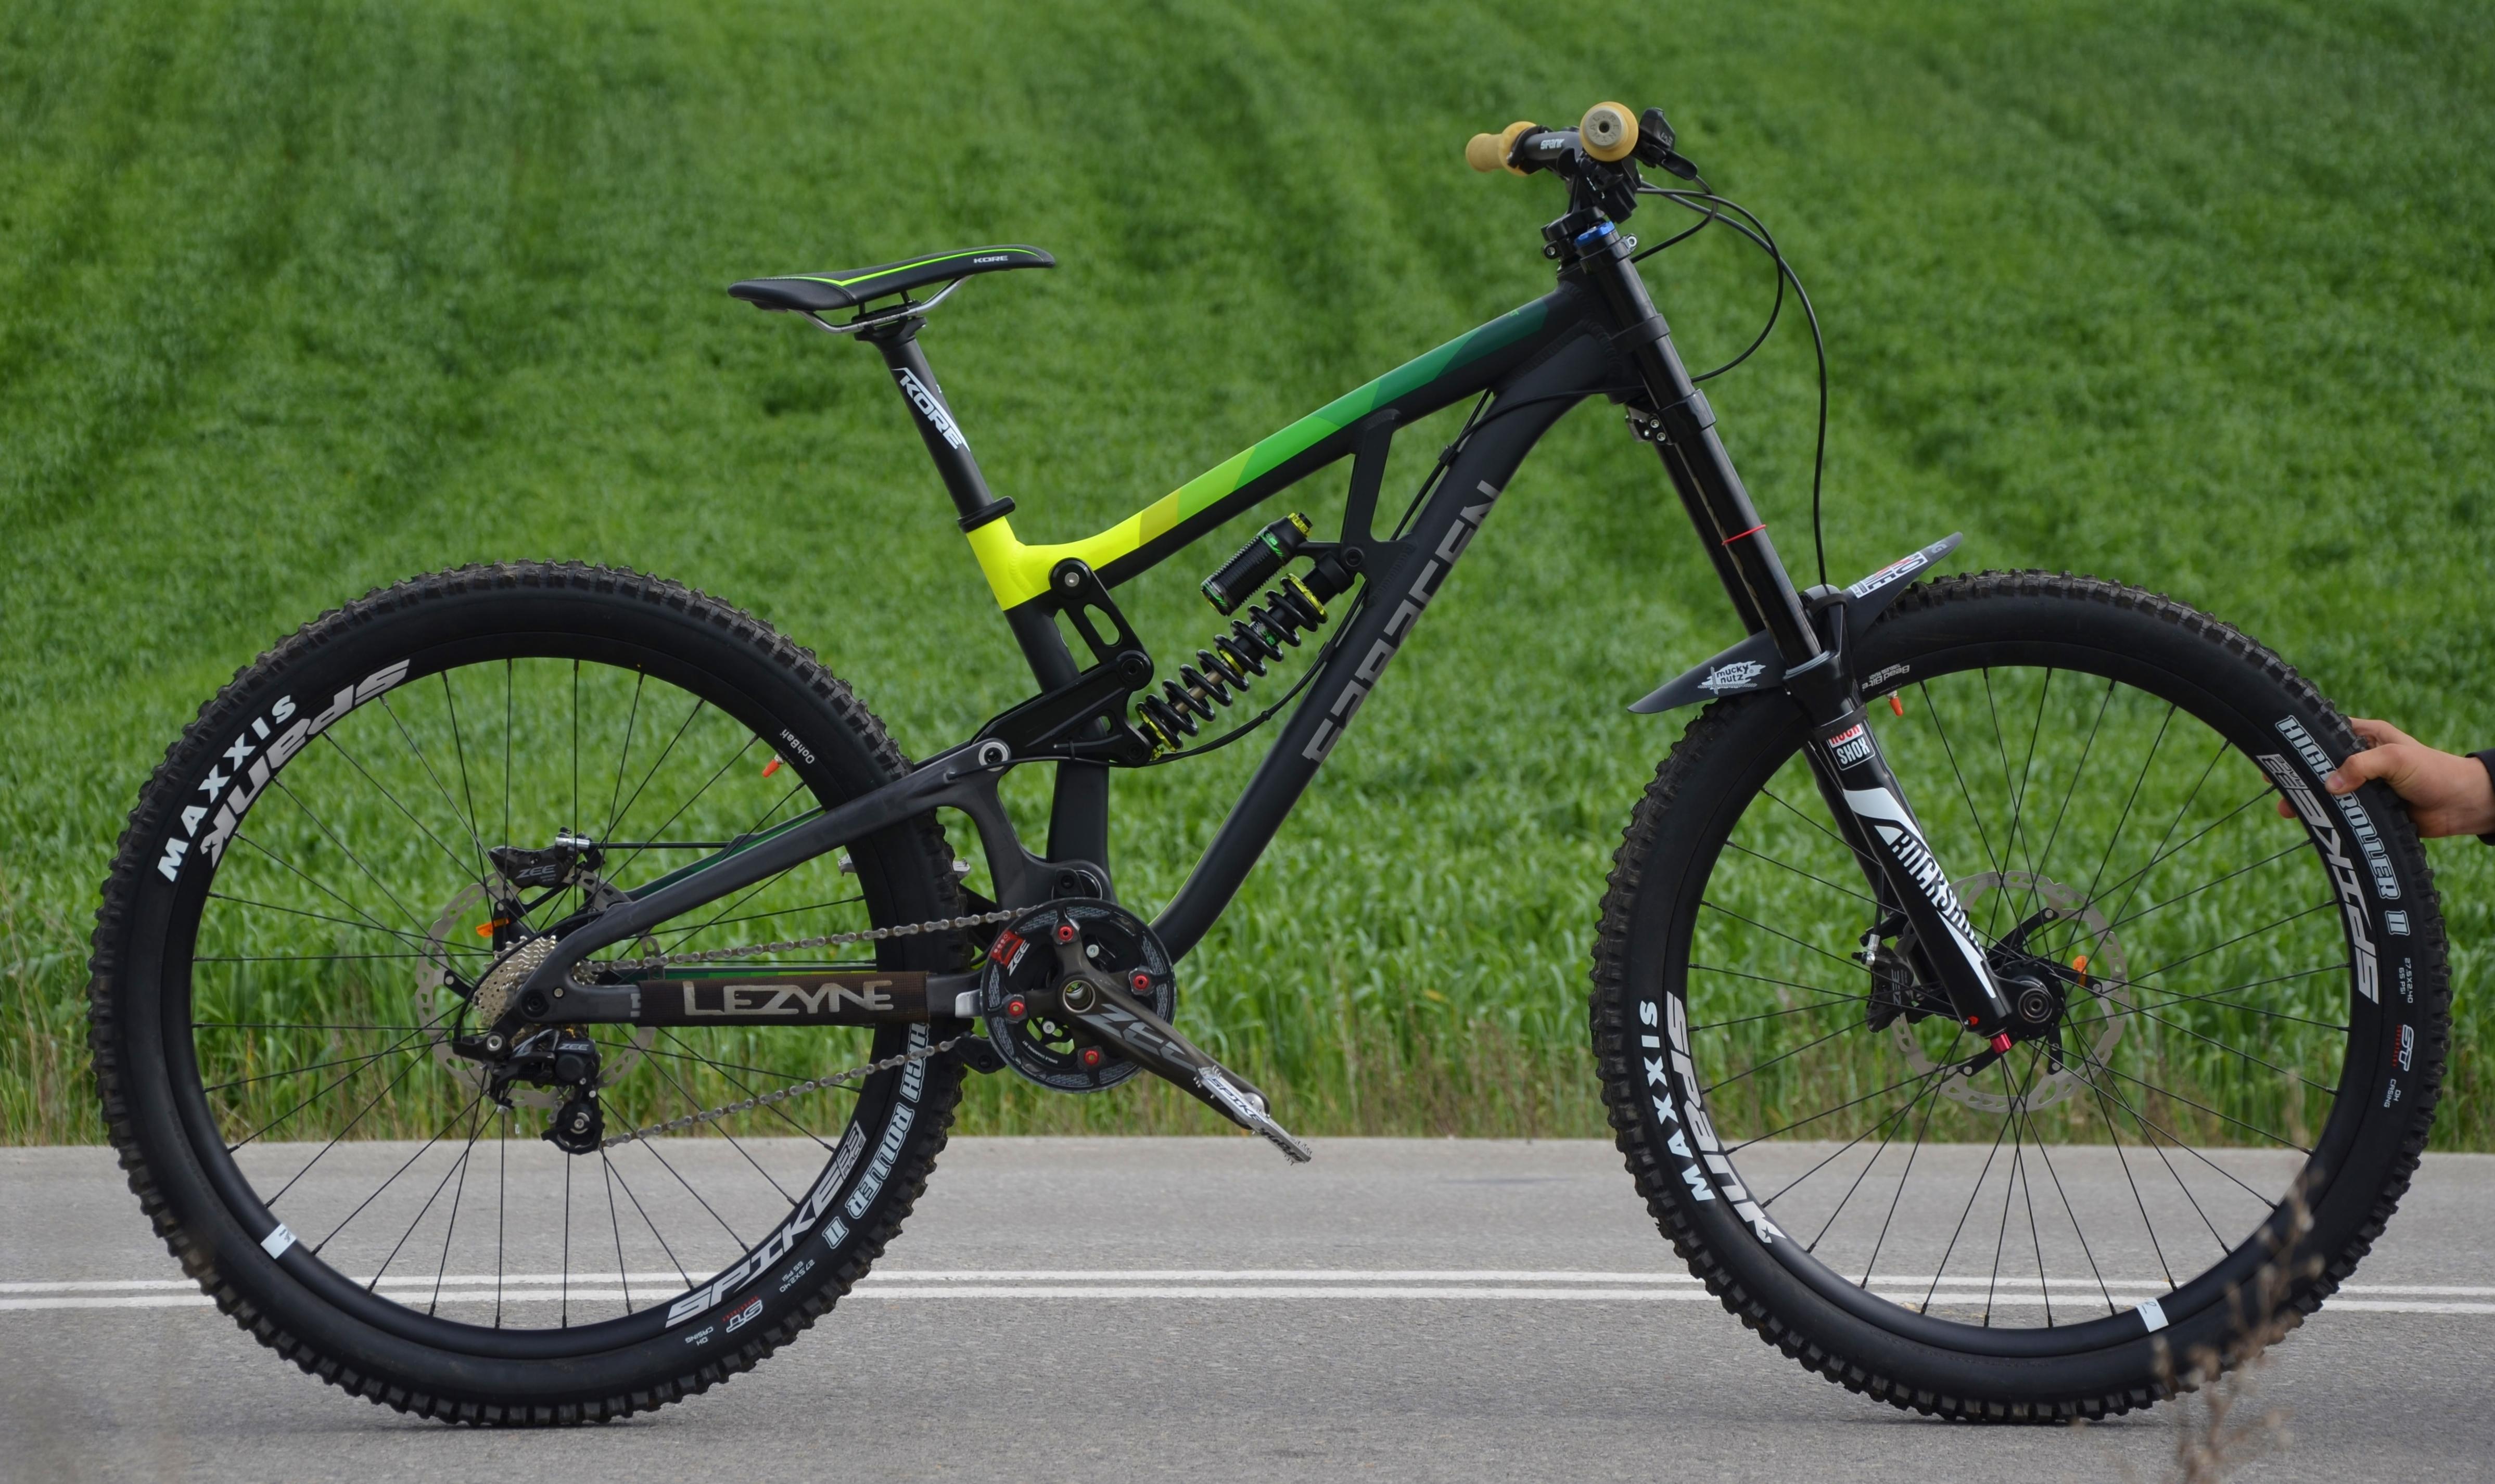 Drag Racing Helmets >> Saracen Myst Pro 2016 - danis.karamichailidis's Bike Check - Vital MTB